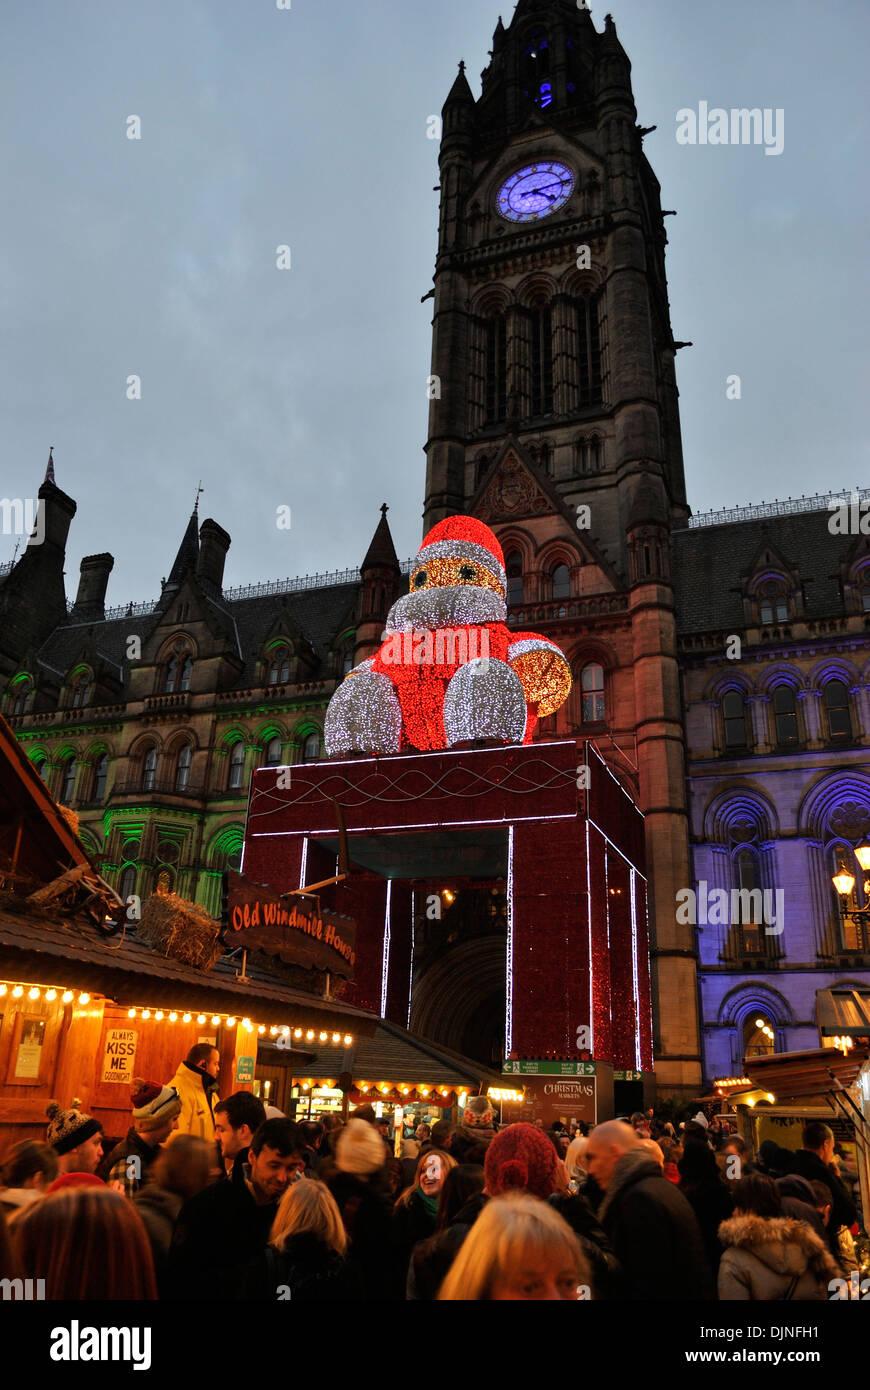 Manchester Christmas Market at dusk - Stock Image